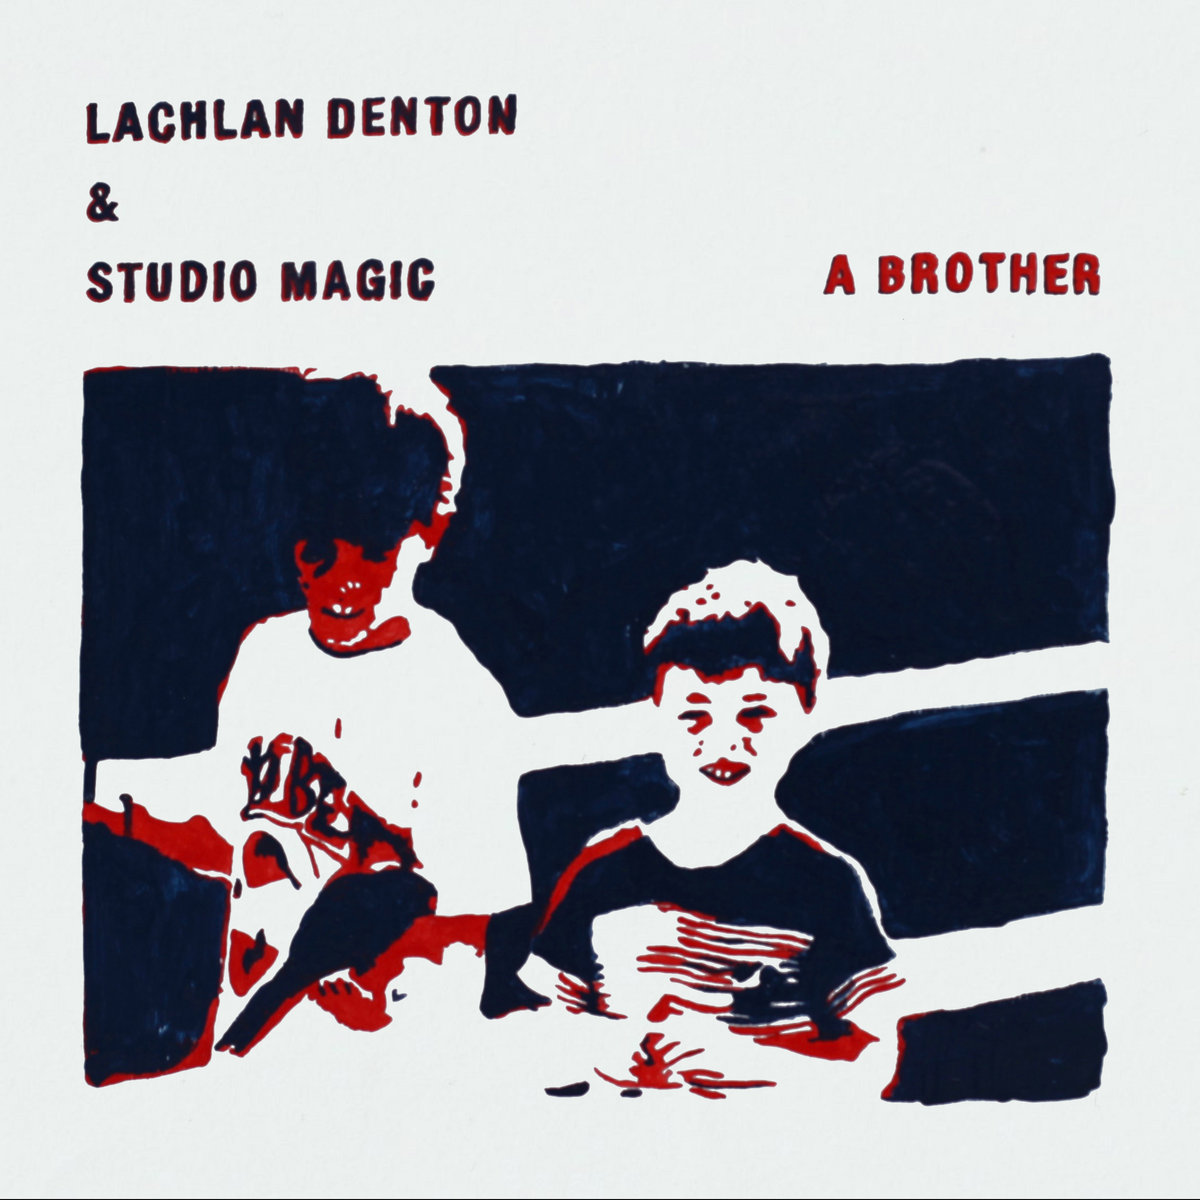 Lachlan Denton & Studio Magic - A Brother